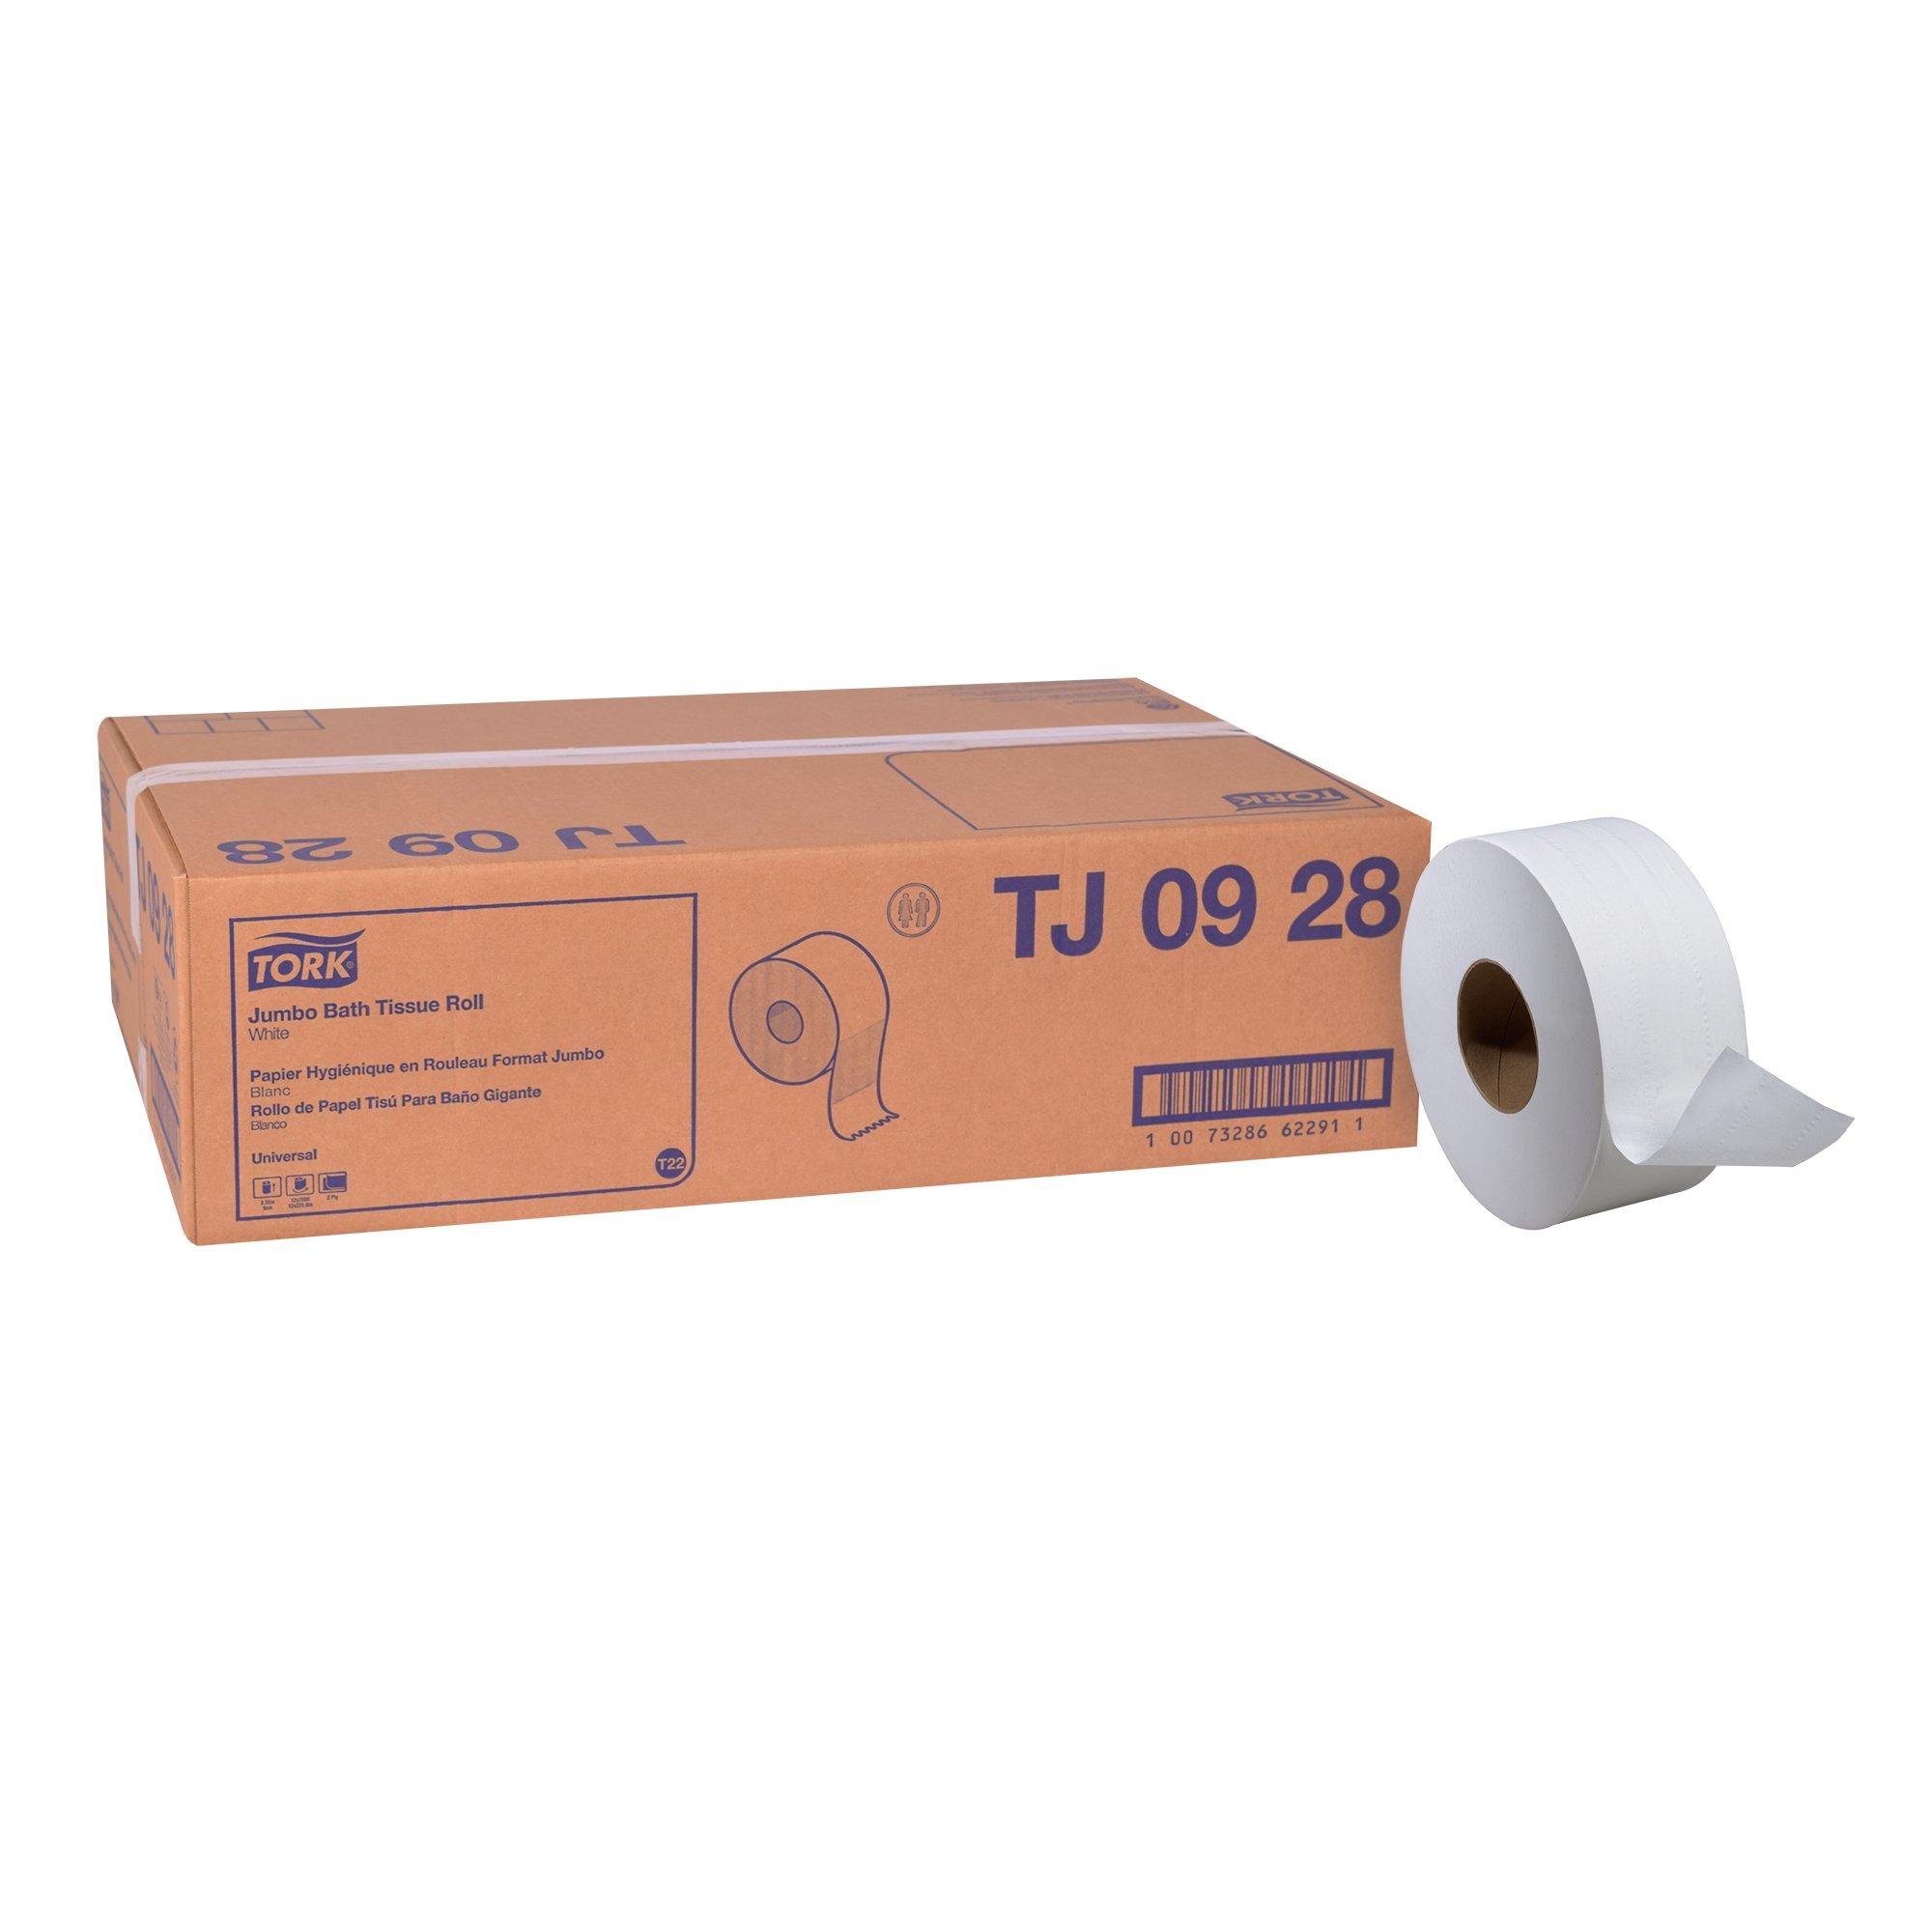 Tork Universal TJ0928 Jumbo Bath Tissue Roll, 2-Ply, 8.8'' Dia, 3.55'' Width x 750' Length, White (Case of 12 Rolls, 750 Per Roll, 9,000 Feet)